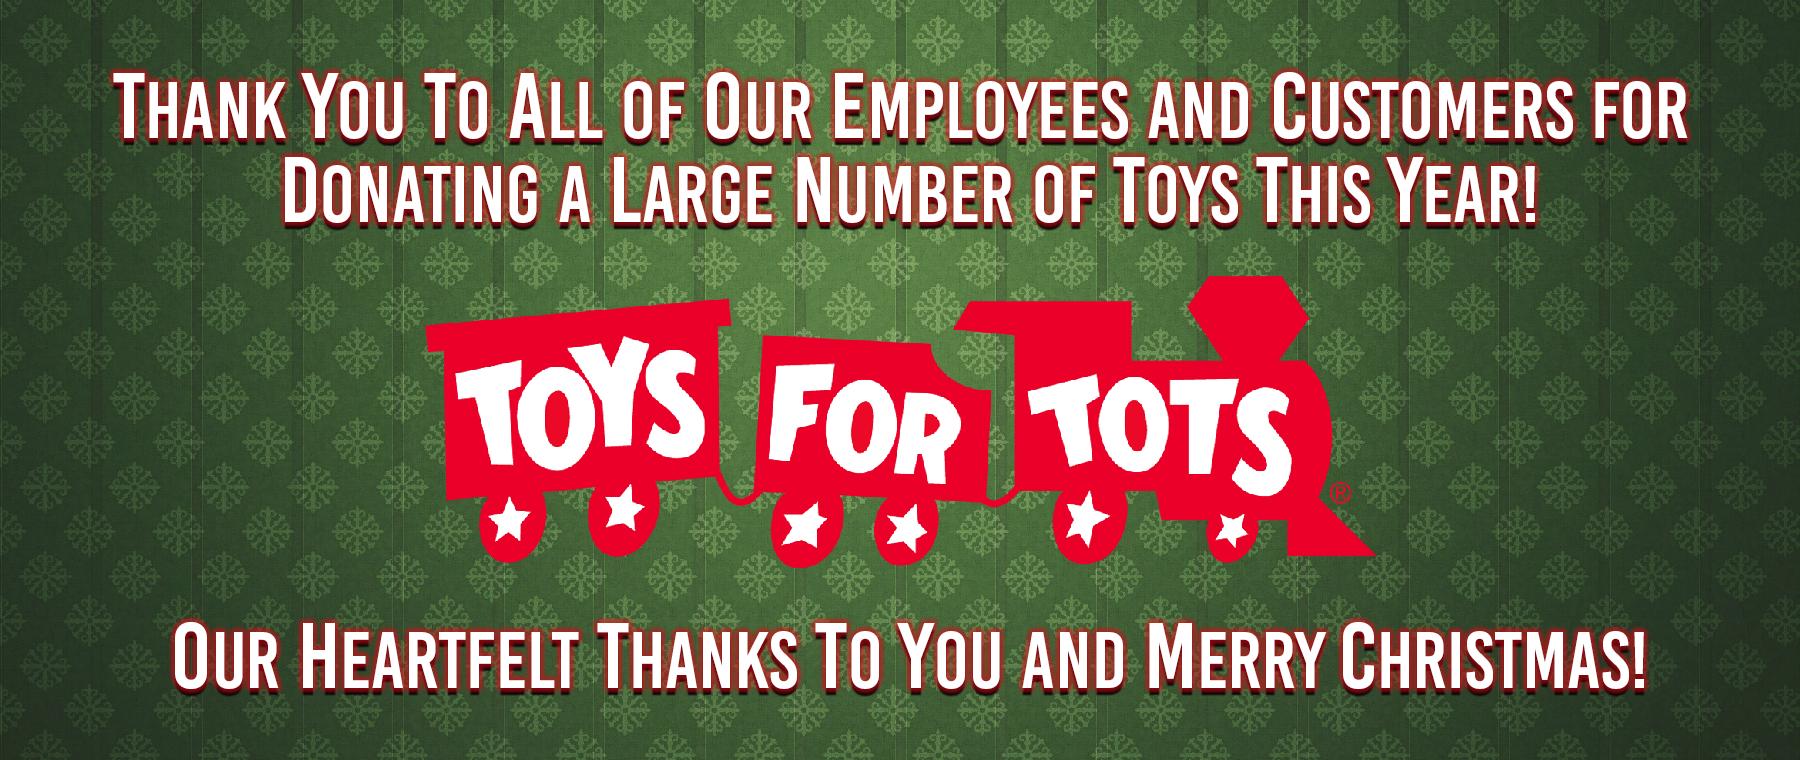 Toys Thank You